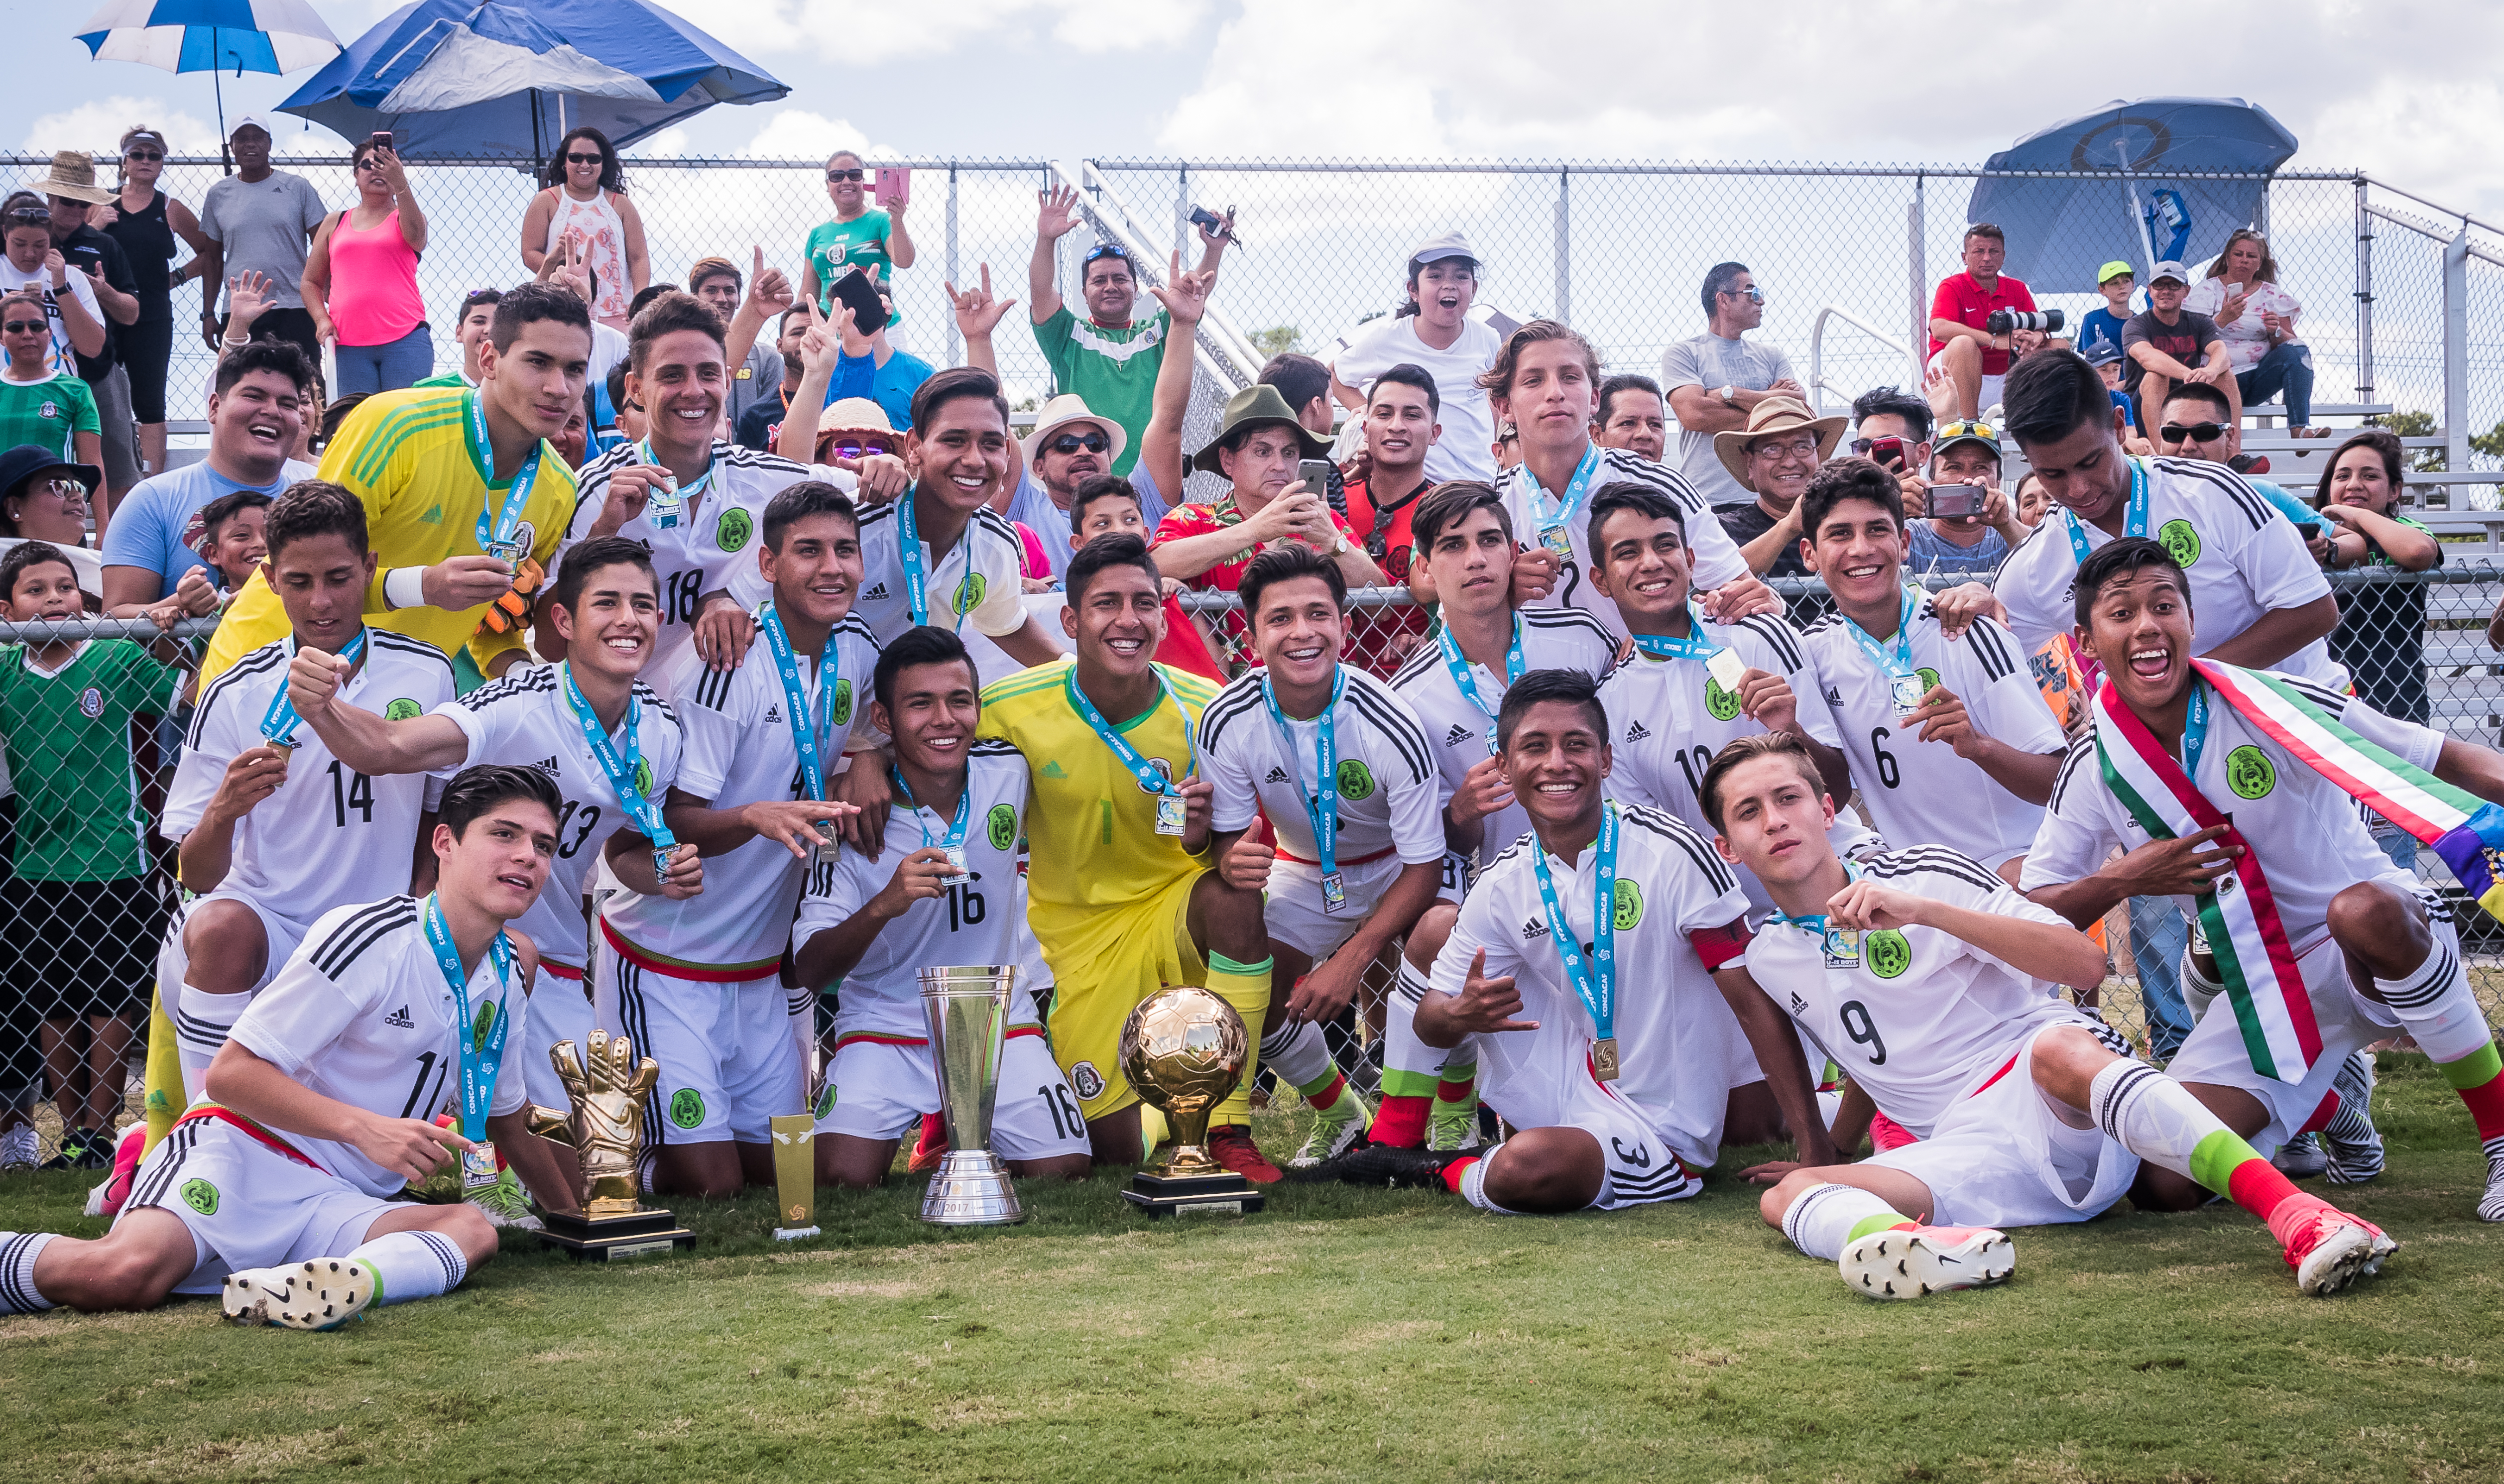 Mexico, USA highlight Concacaf Boys' Under-15 Championship Division 1